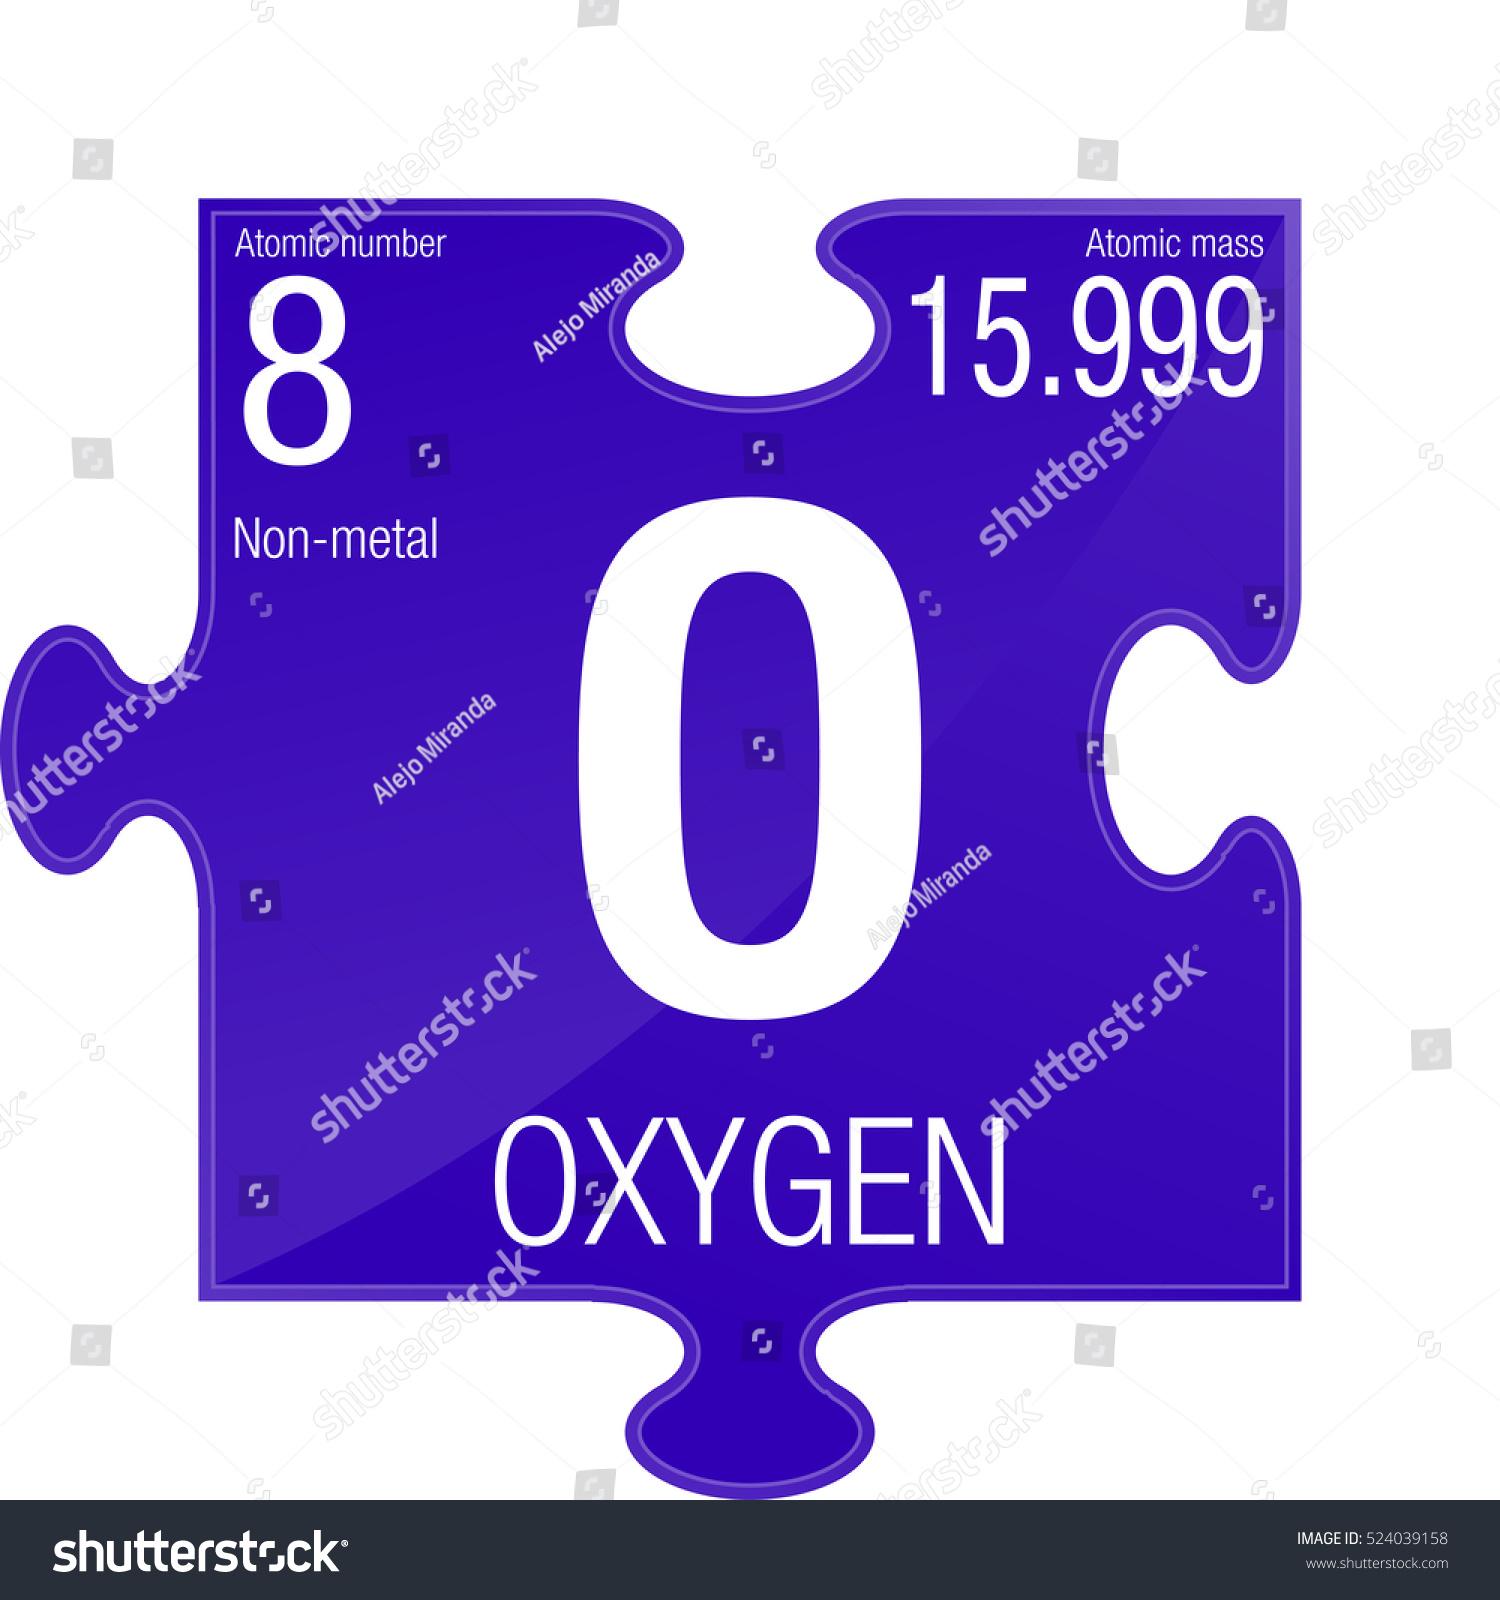 Oxygen symbol element number 8 periodic stock vector 524039158 element number 8 of the periodic table of the elements chemistry urtaz Image collections